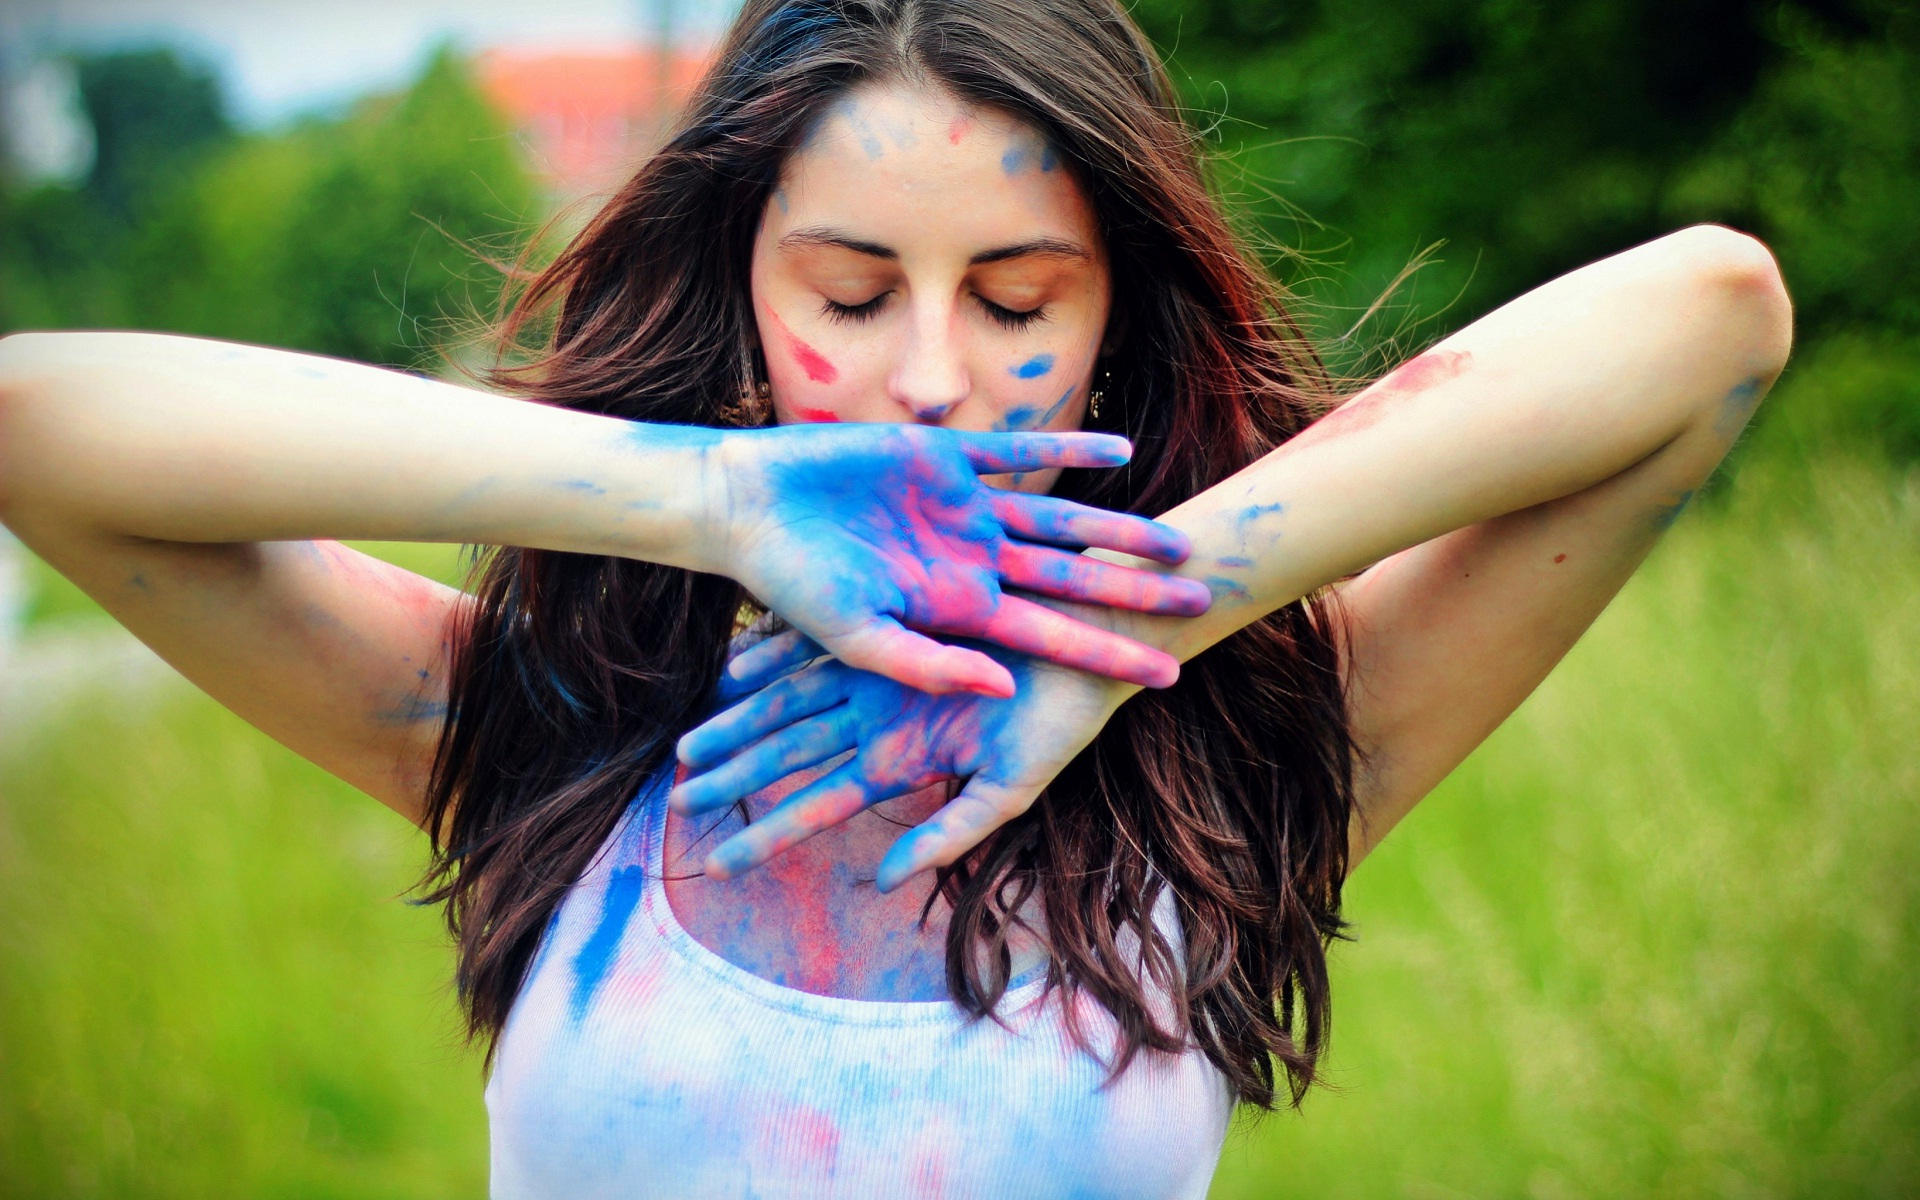 Colors hand of romantic mood girl wallpaper